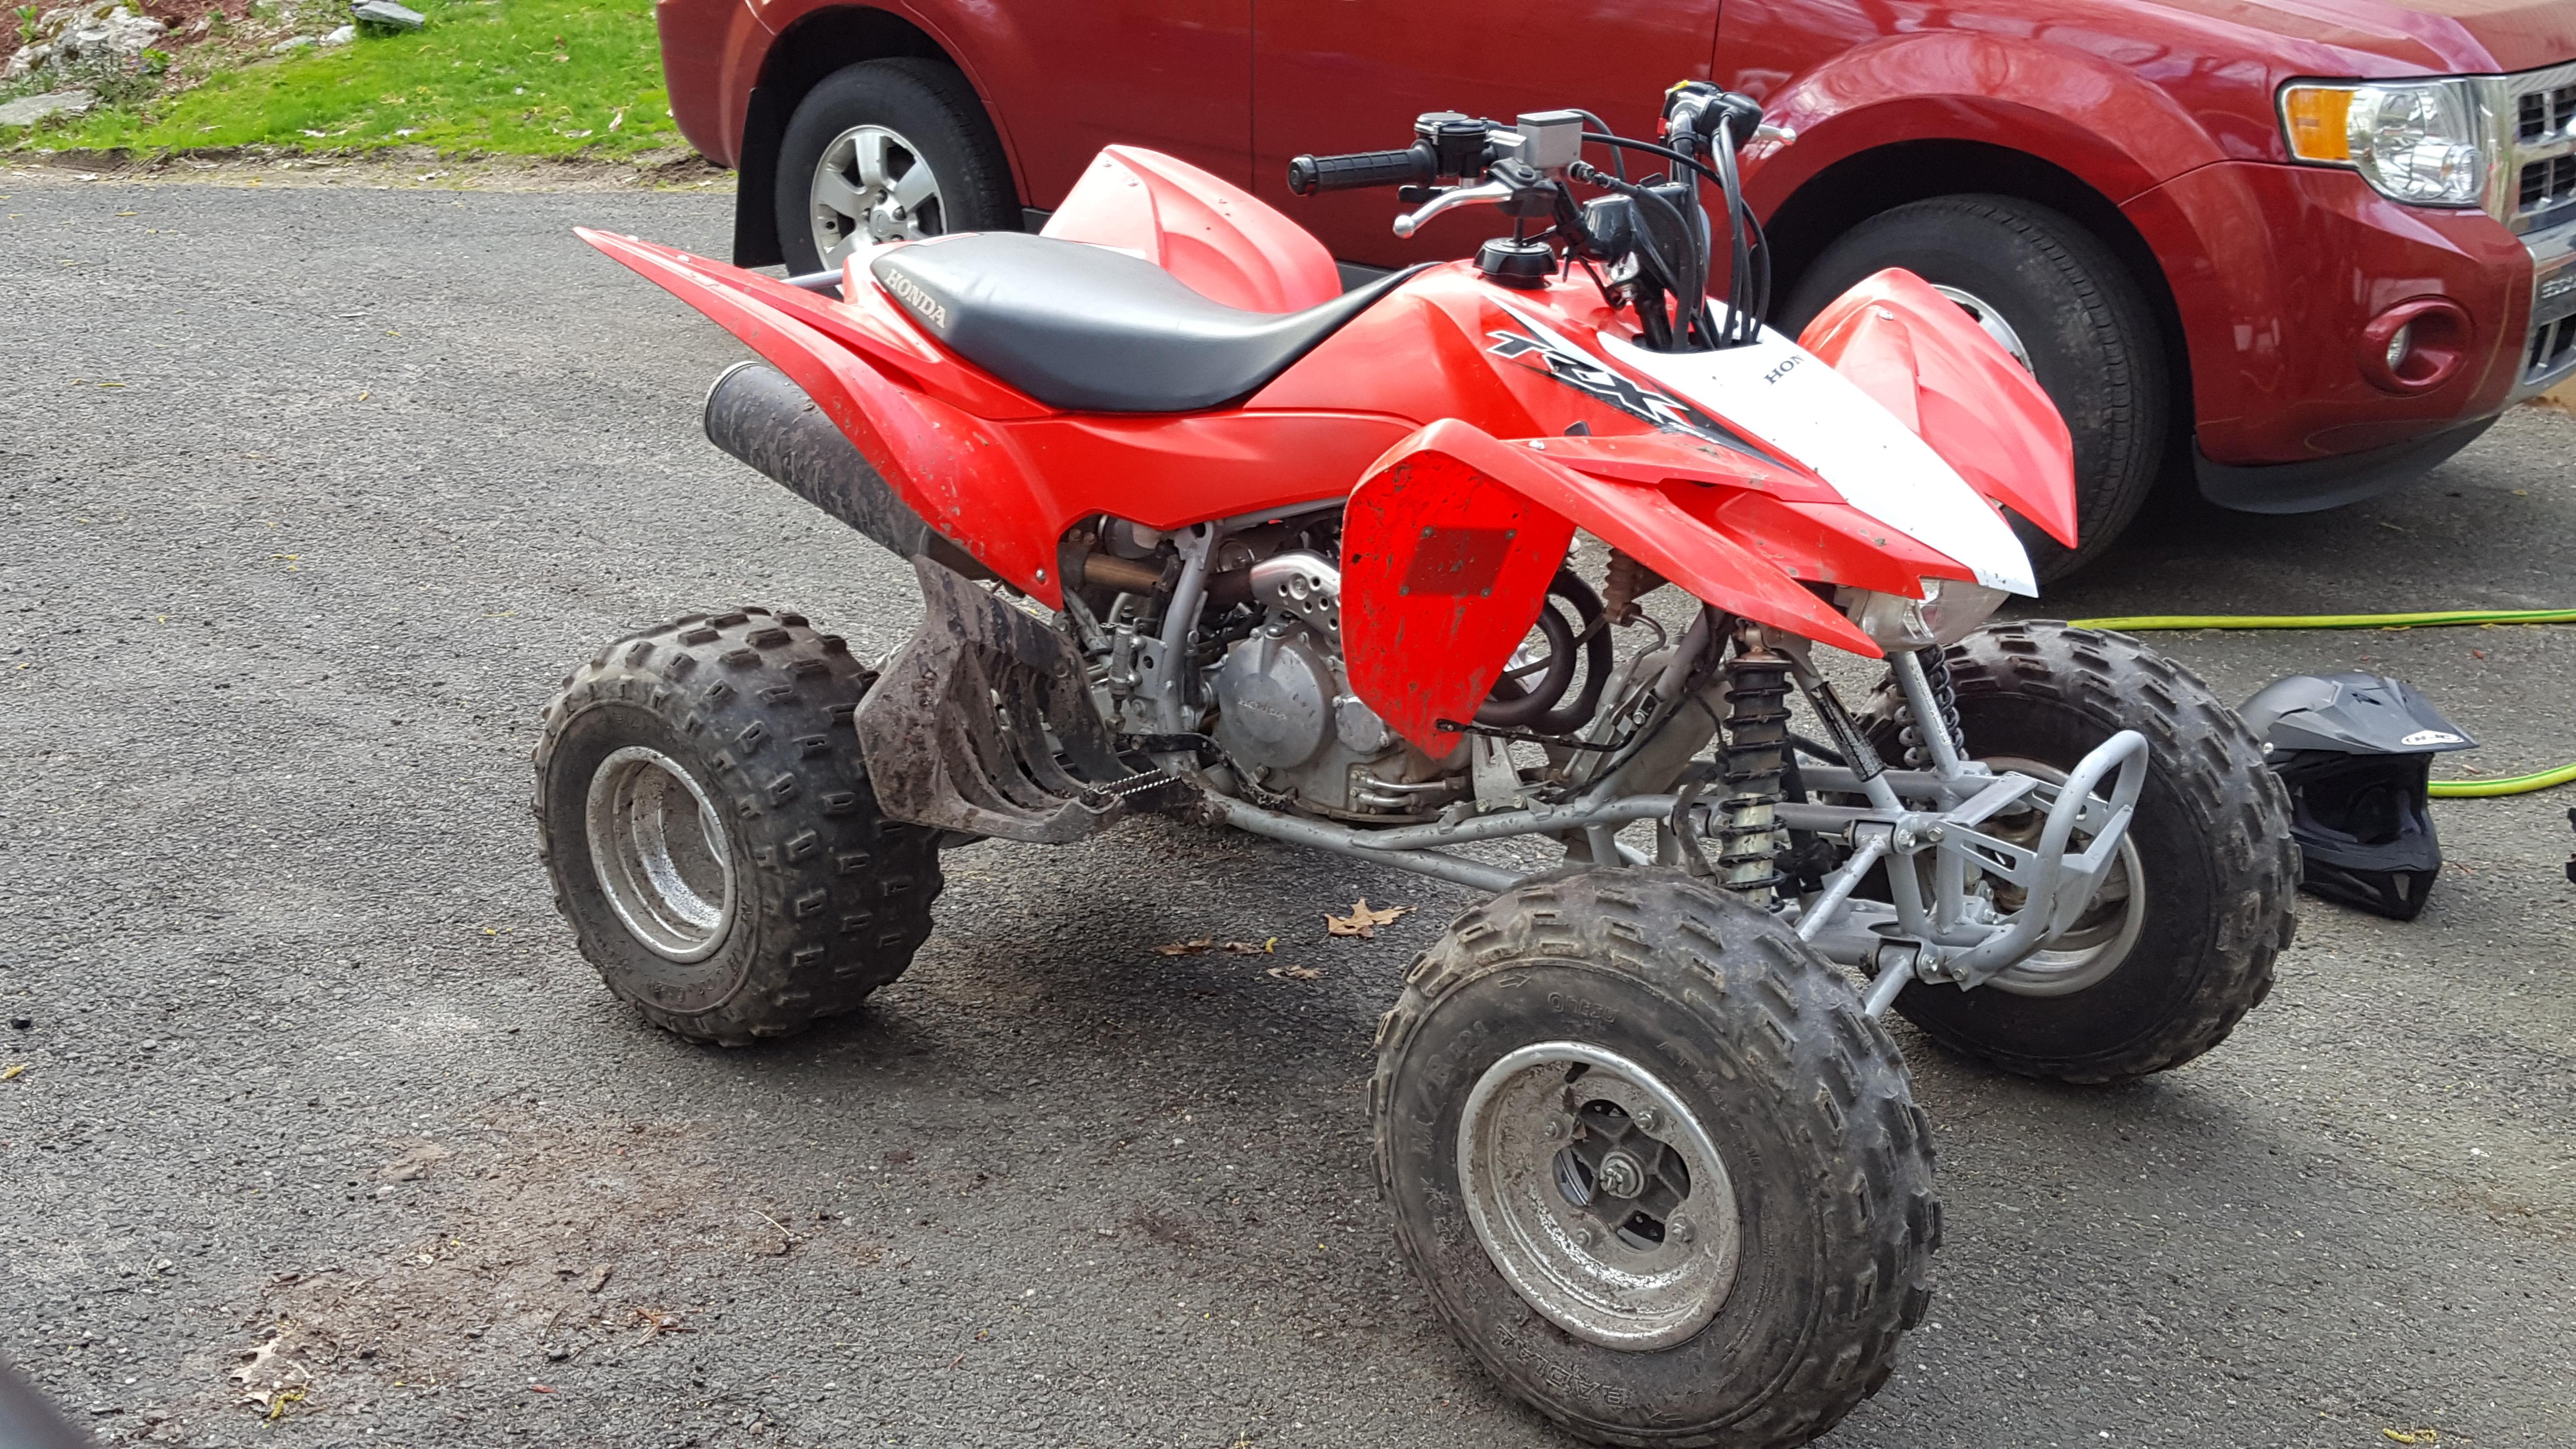 TRX250 or TRX400 for Experienced 14 Year Old - Honda ATV Forum